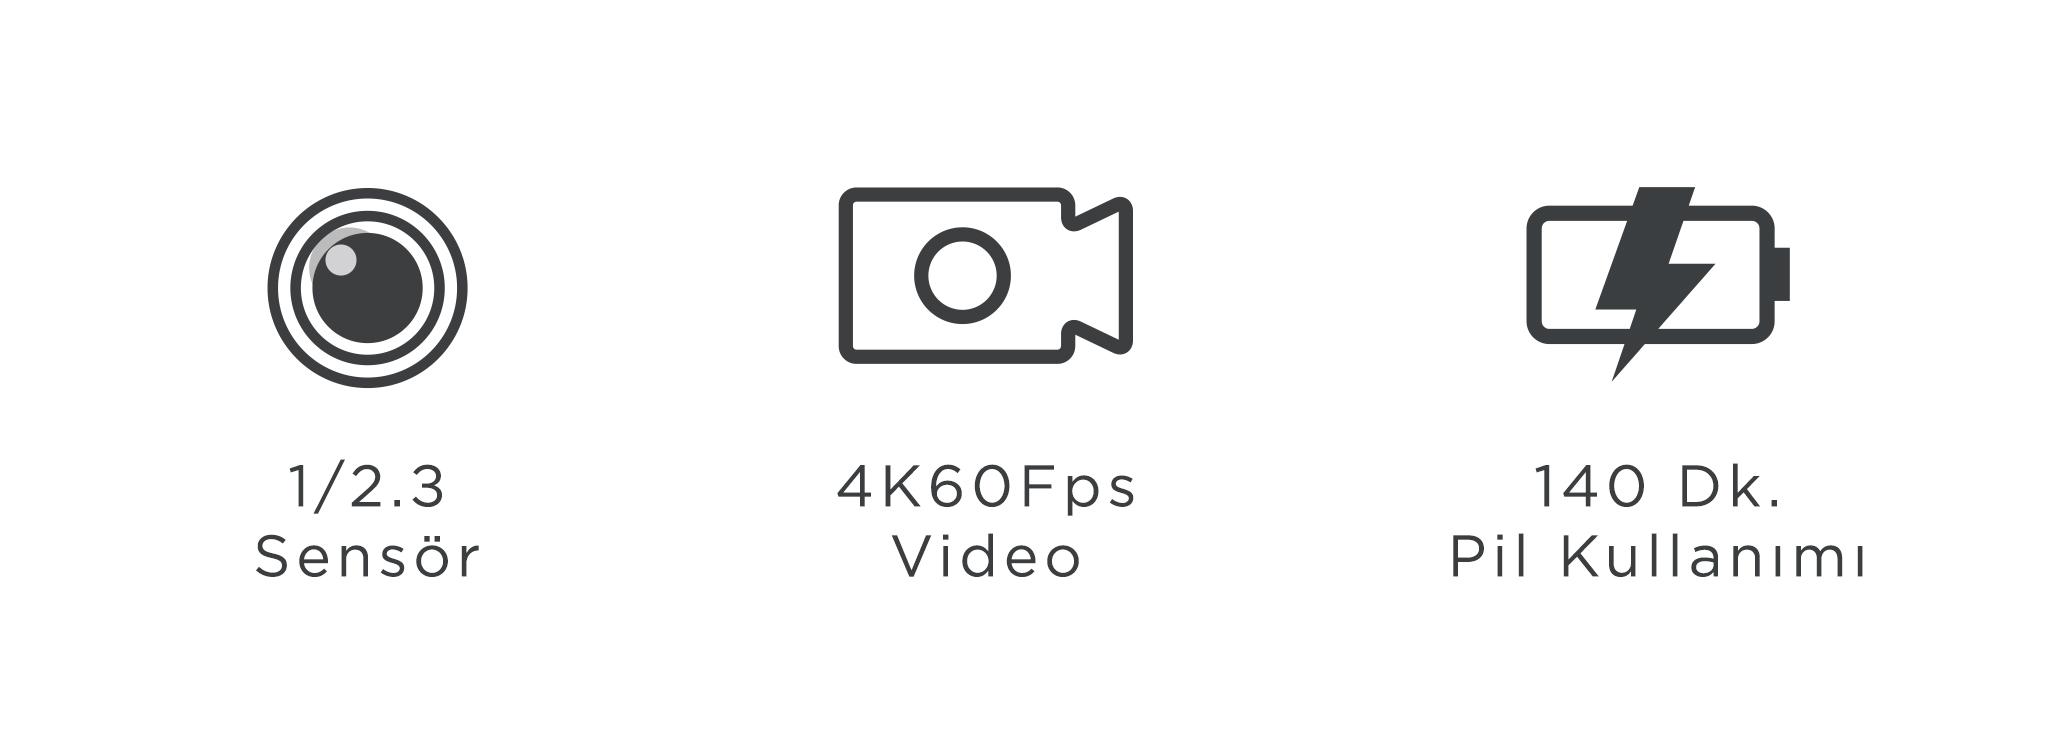 https://www.karacasulu.com/wp-content/uploads/2020/03/icons2.jpg